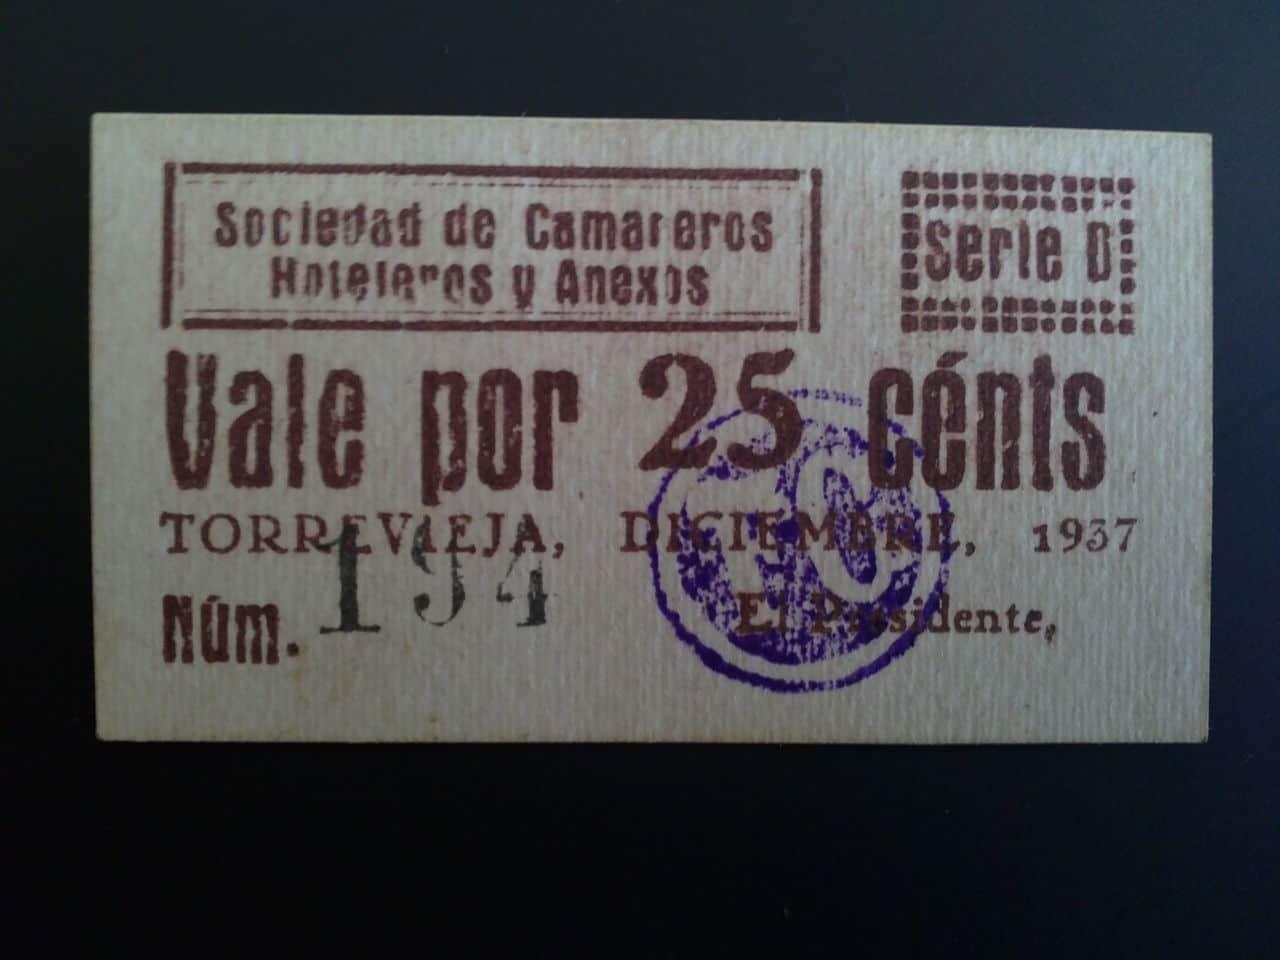 25 Céntimos Torrevieja (Alicante) Diciembre 1937 01022013025